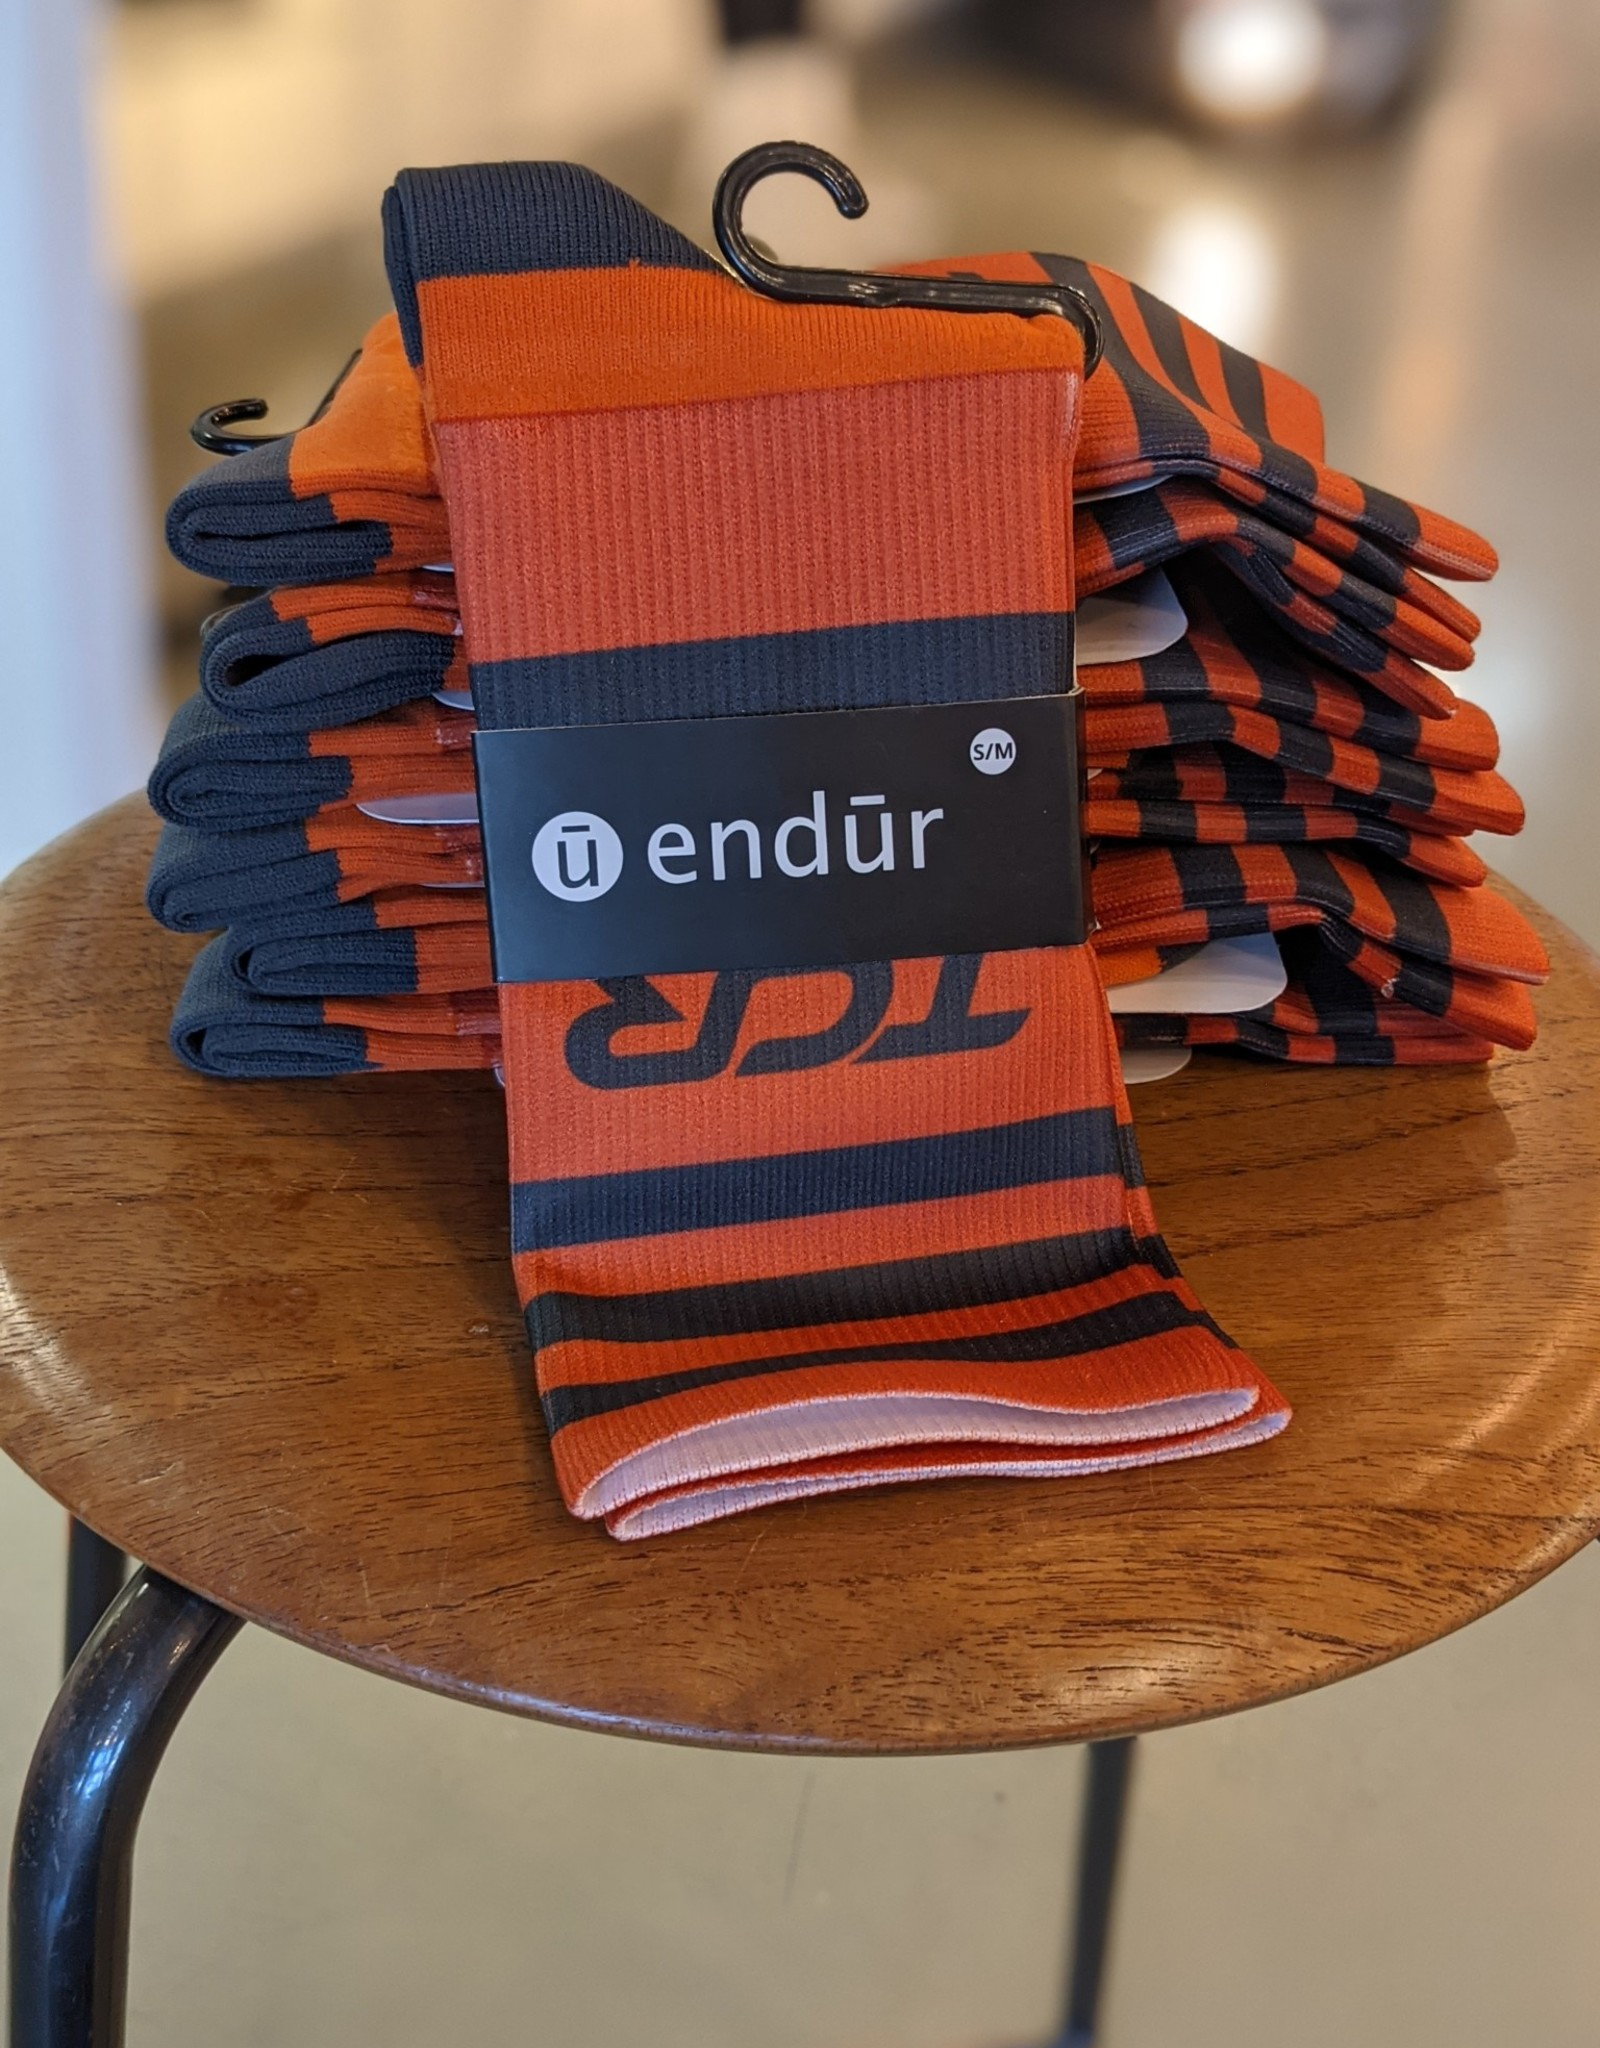 Endur - TCR Knit Sock- Orange/Grey -